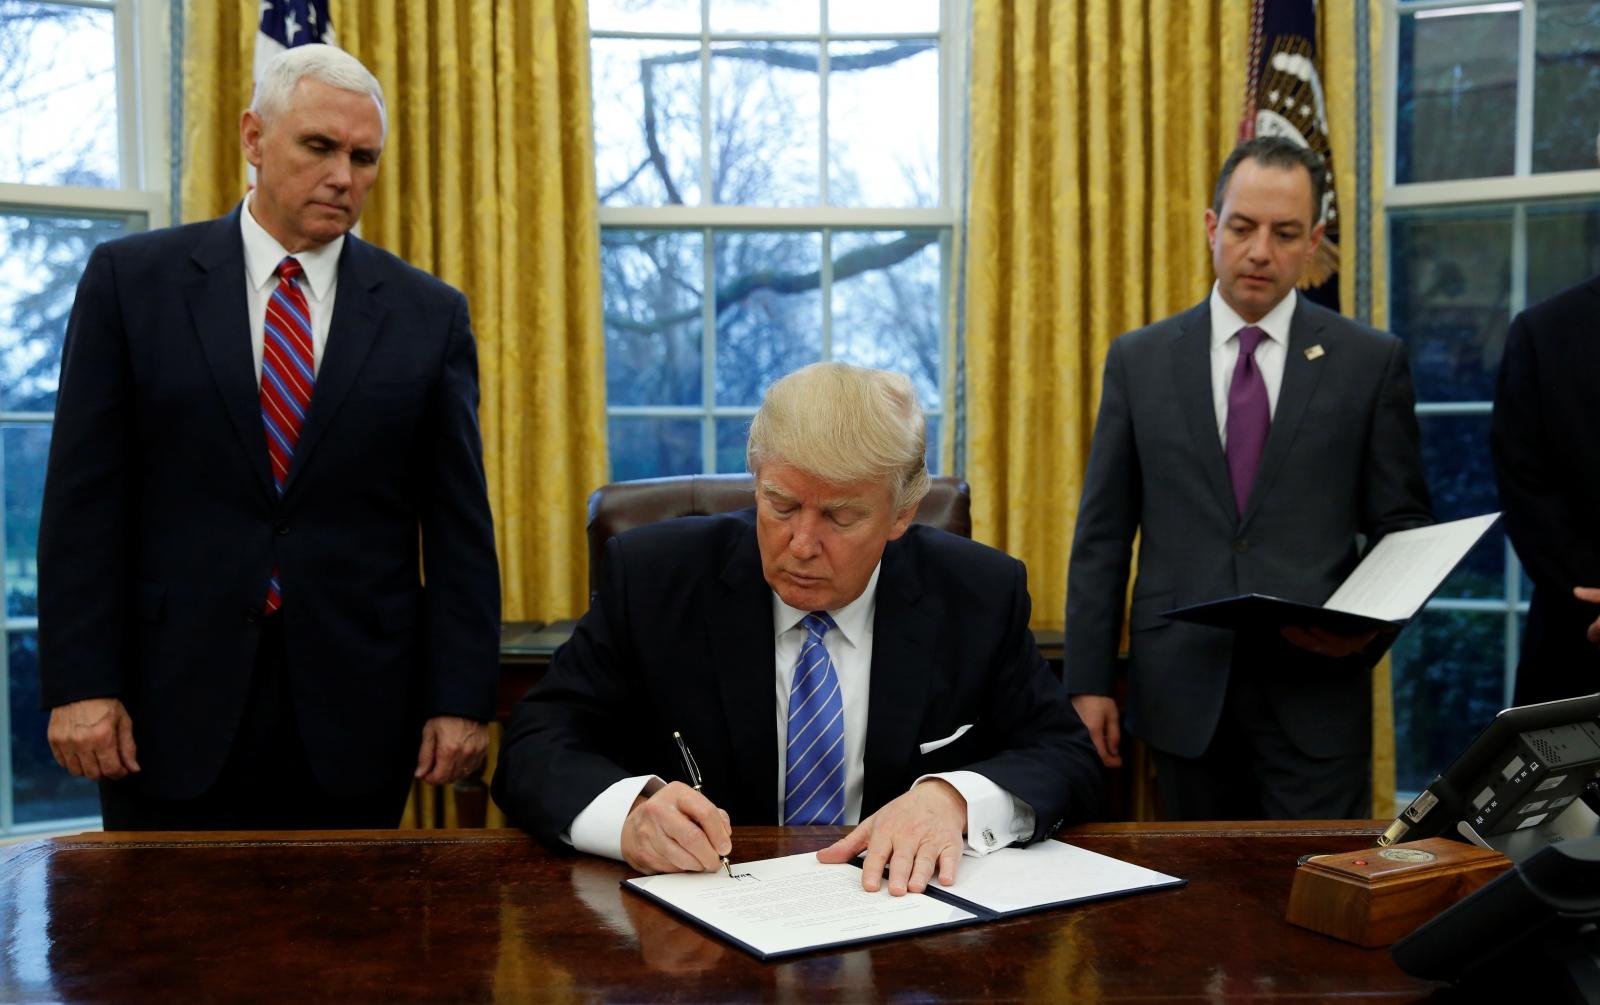 Trump signs TPP withdrawal